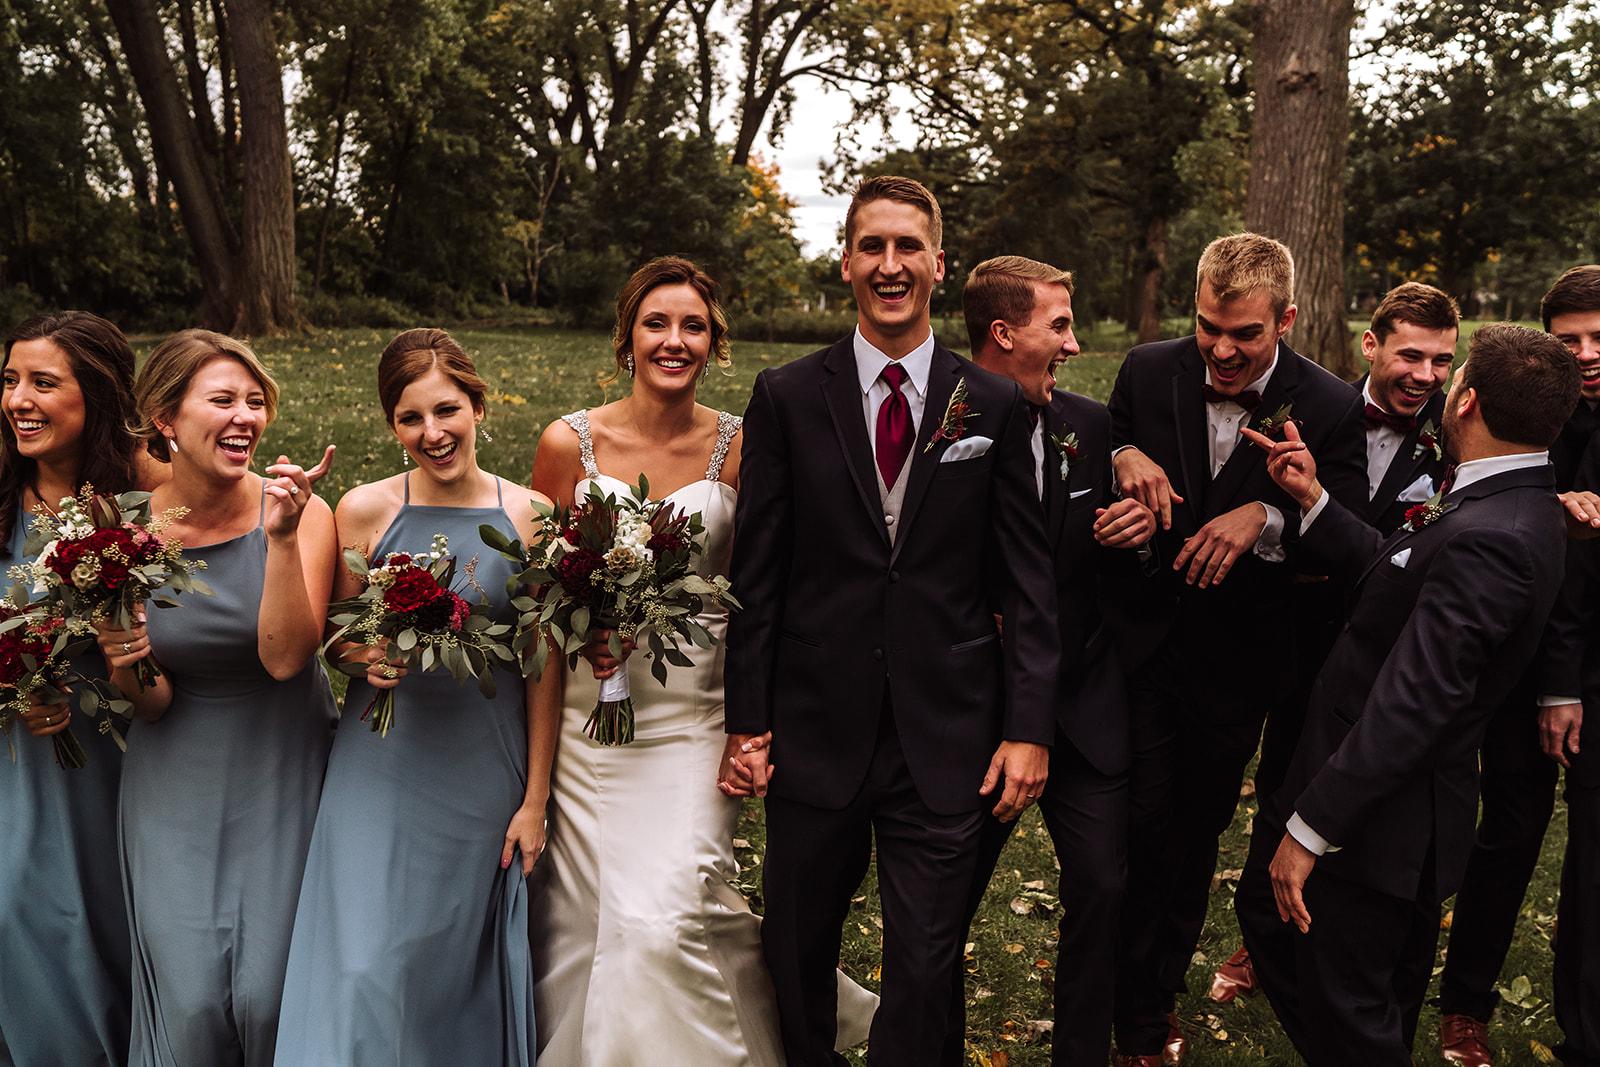 Scott and Andrea Wedding 2018-665.jpg